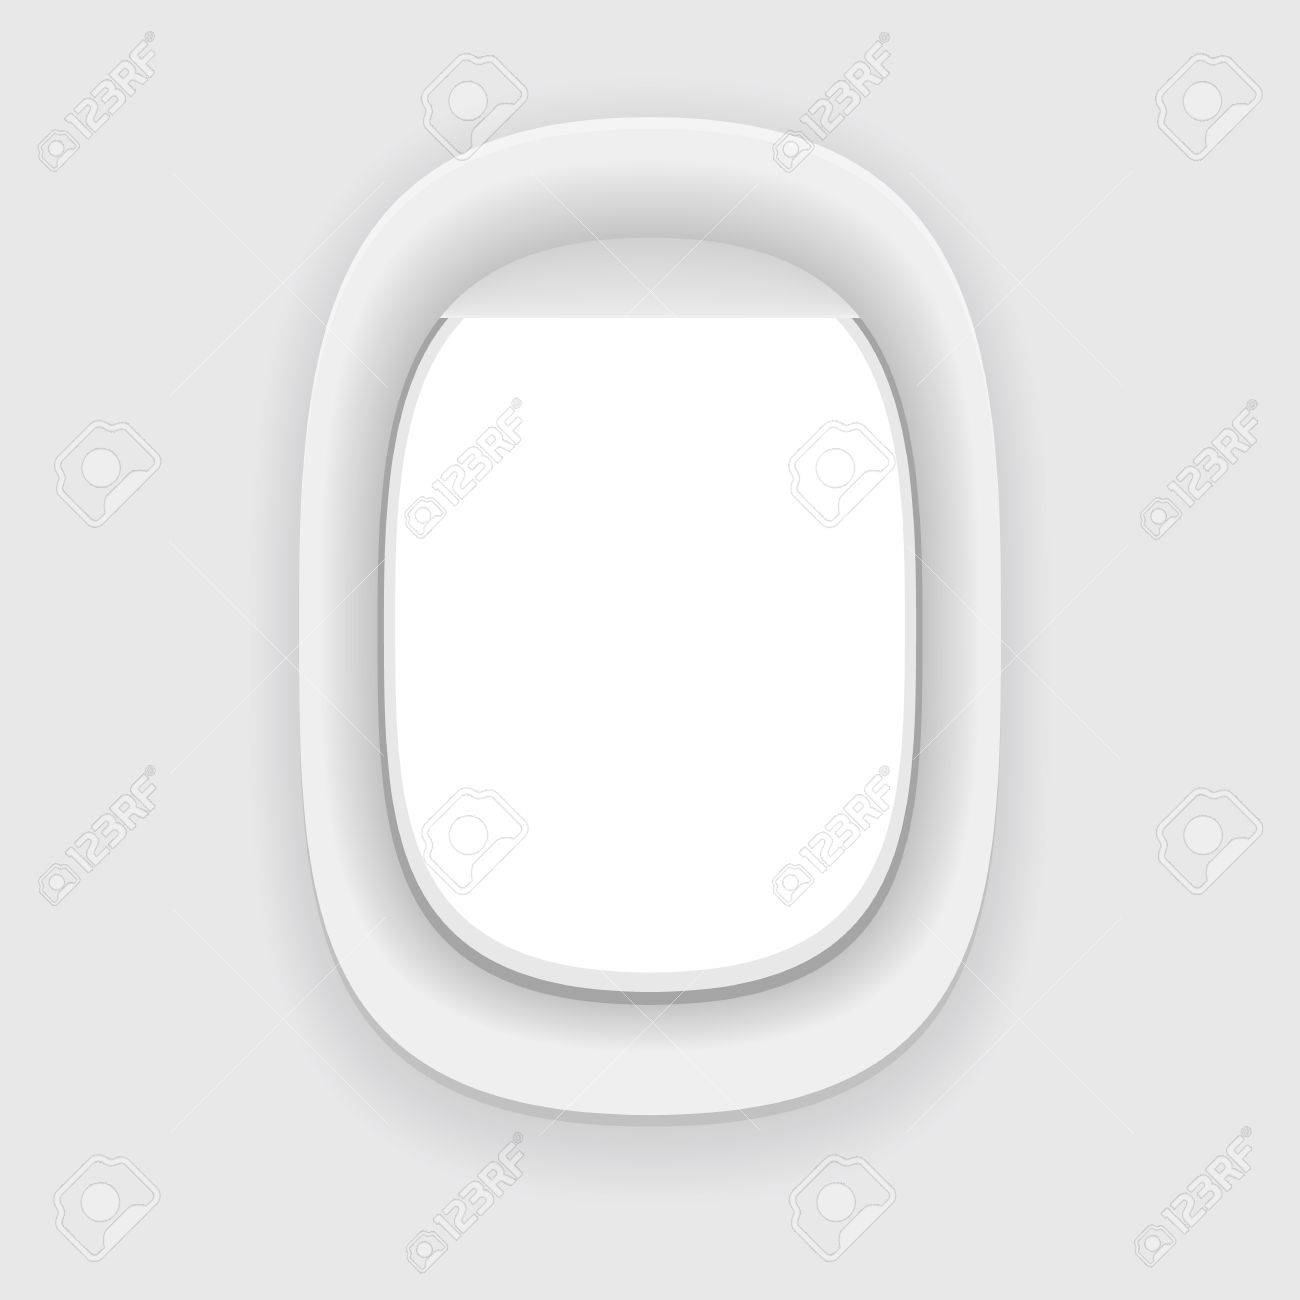 Aircraft Window Plane Porthole Isolated On White Vector